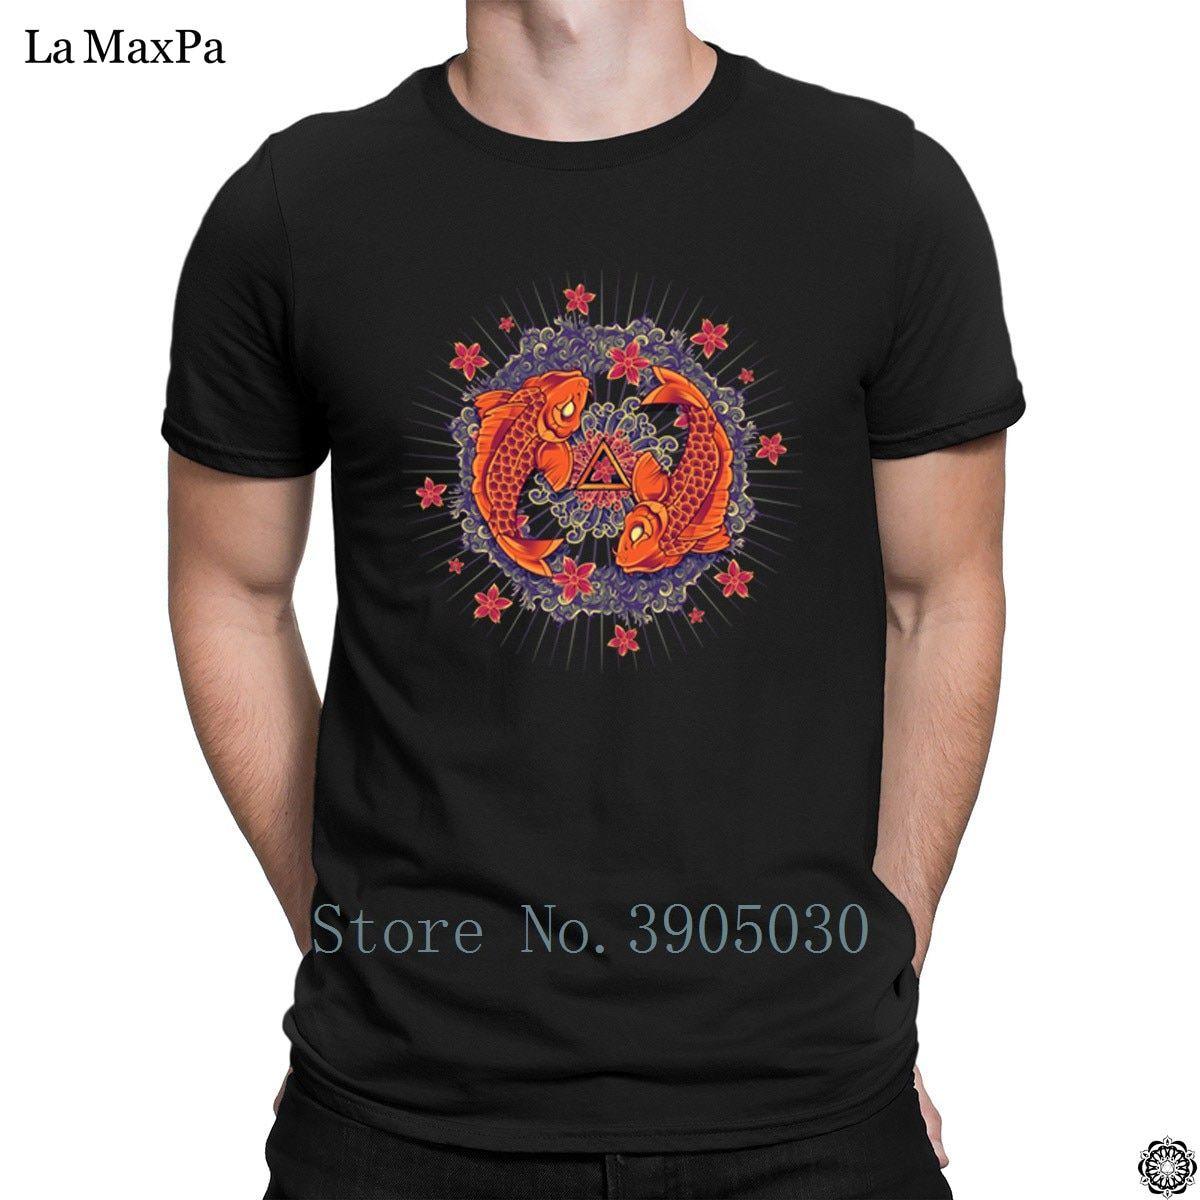 0df5354cca7 T shirts with mandalas - Men T-Shirt Koi Mandala T Shirt New Men - Tshirt  for mystic people